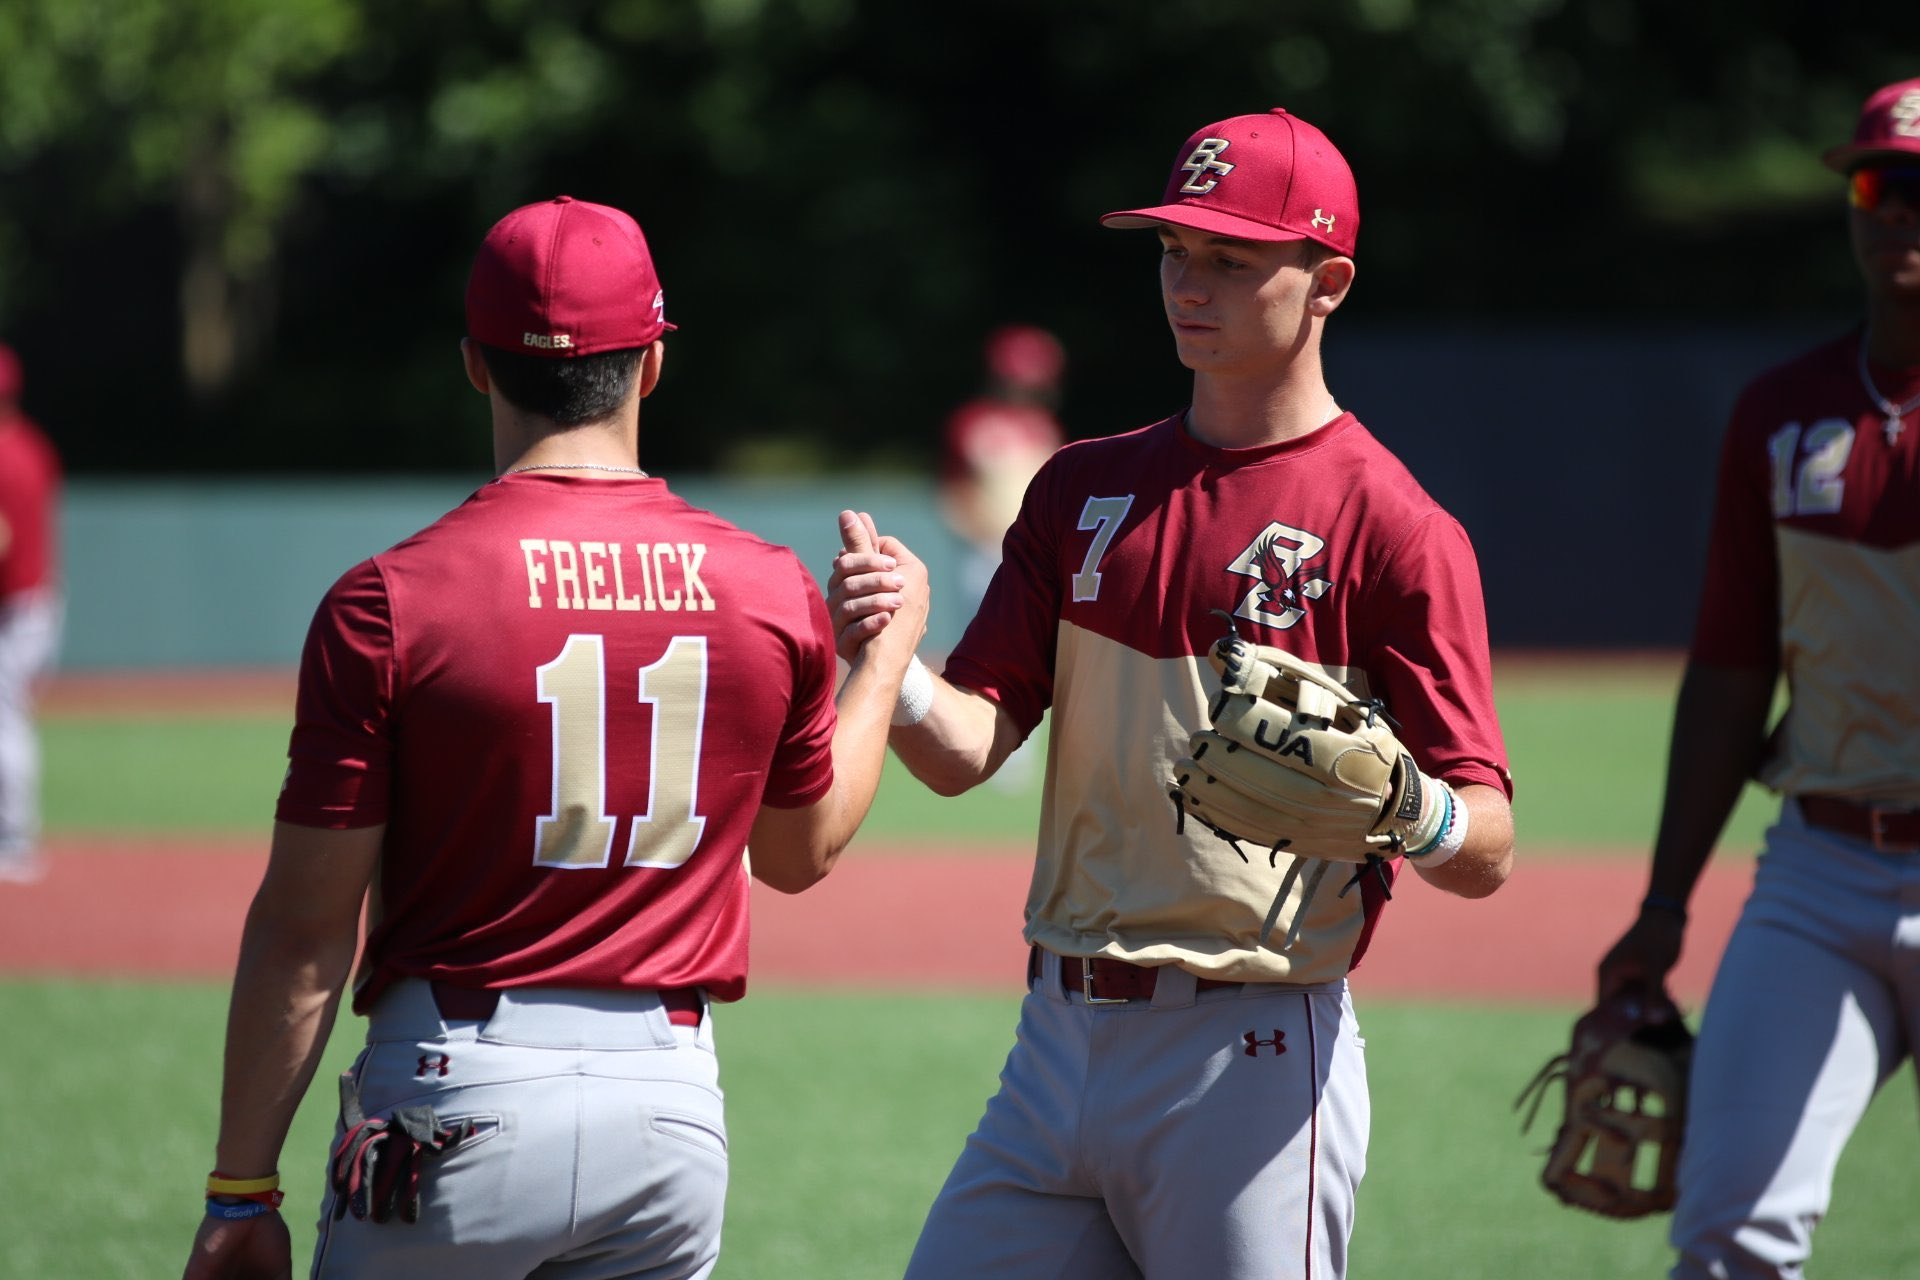 Boston College Baseball Releases 2020 Schedule